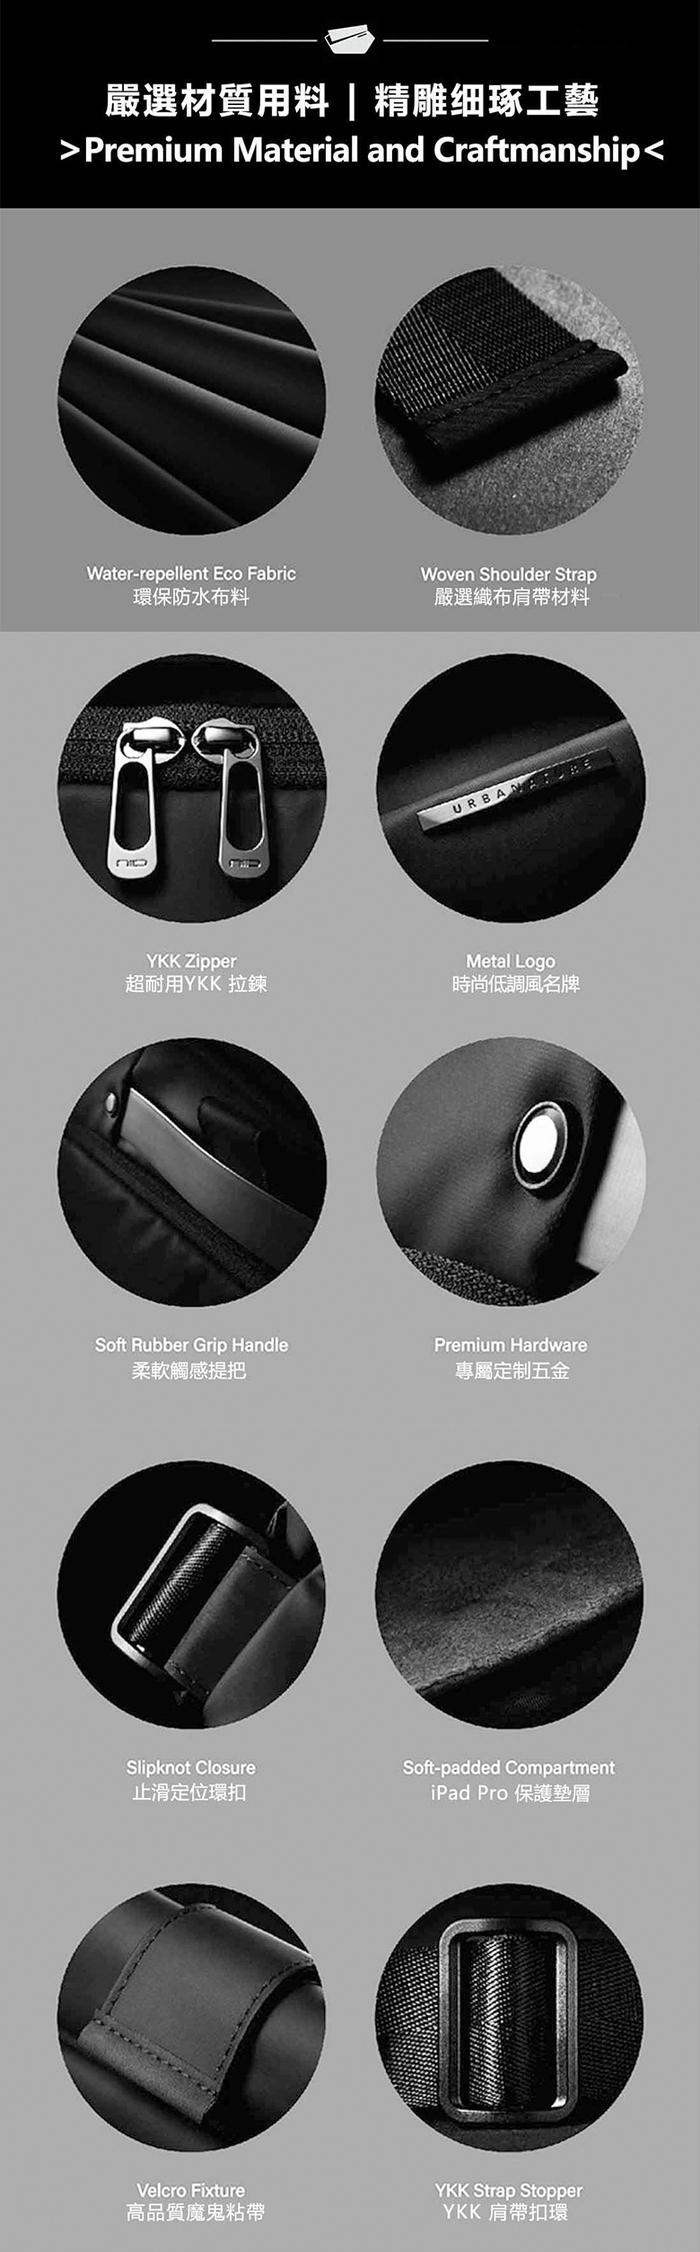 【集購】Radiant | R1 極速行動單肩包